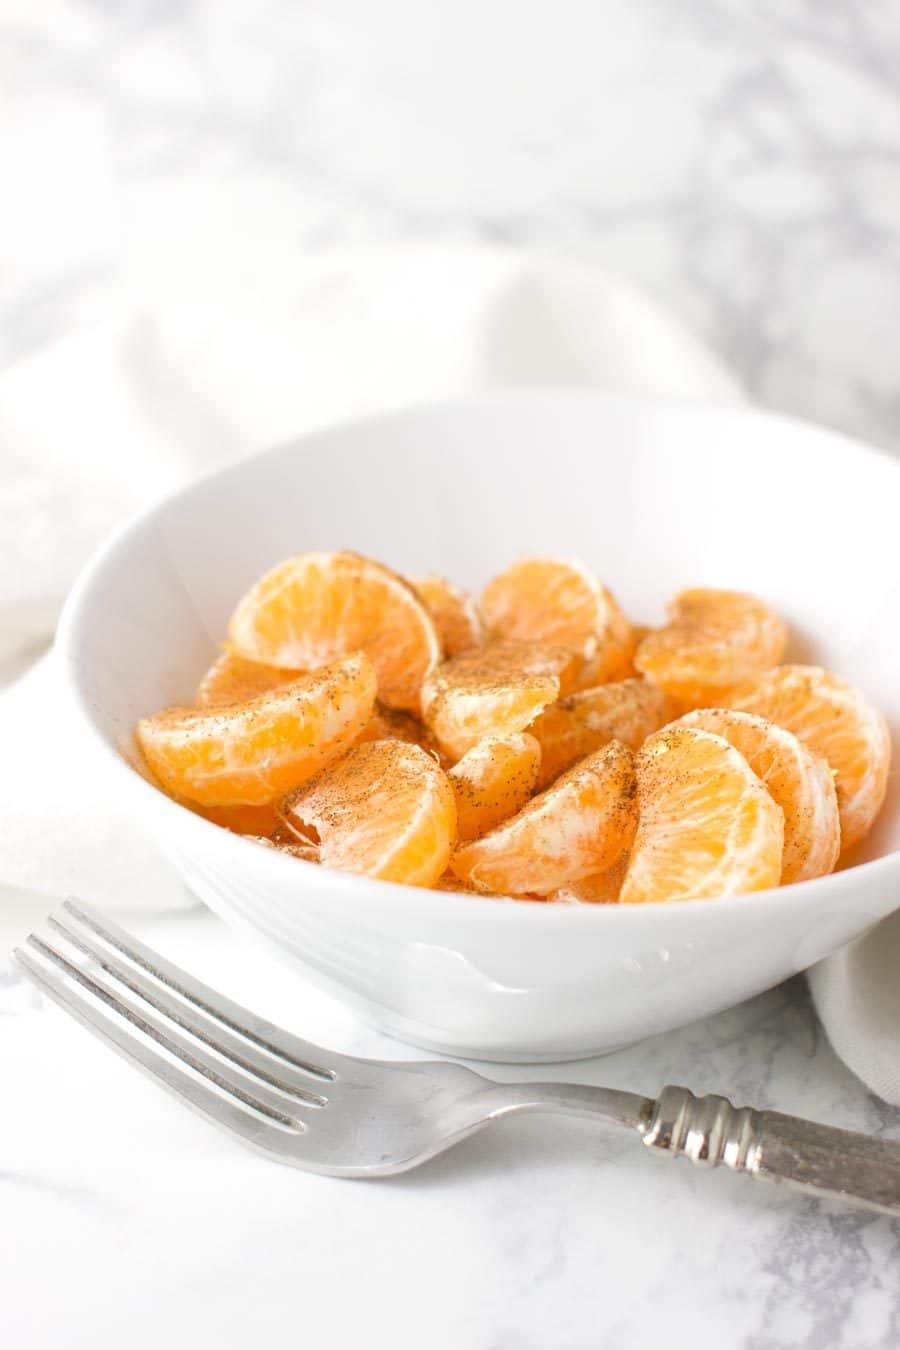 Honey-Cinnamon Oranges recipe from acleanplate.com #paleo #aip #autoimmuneprotocol